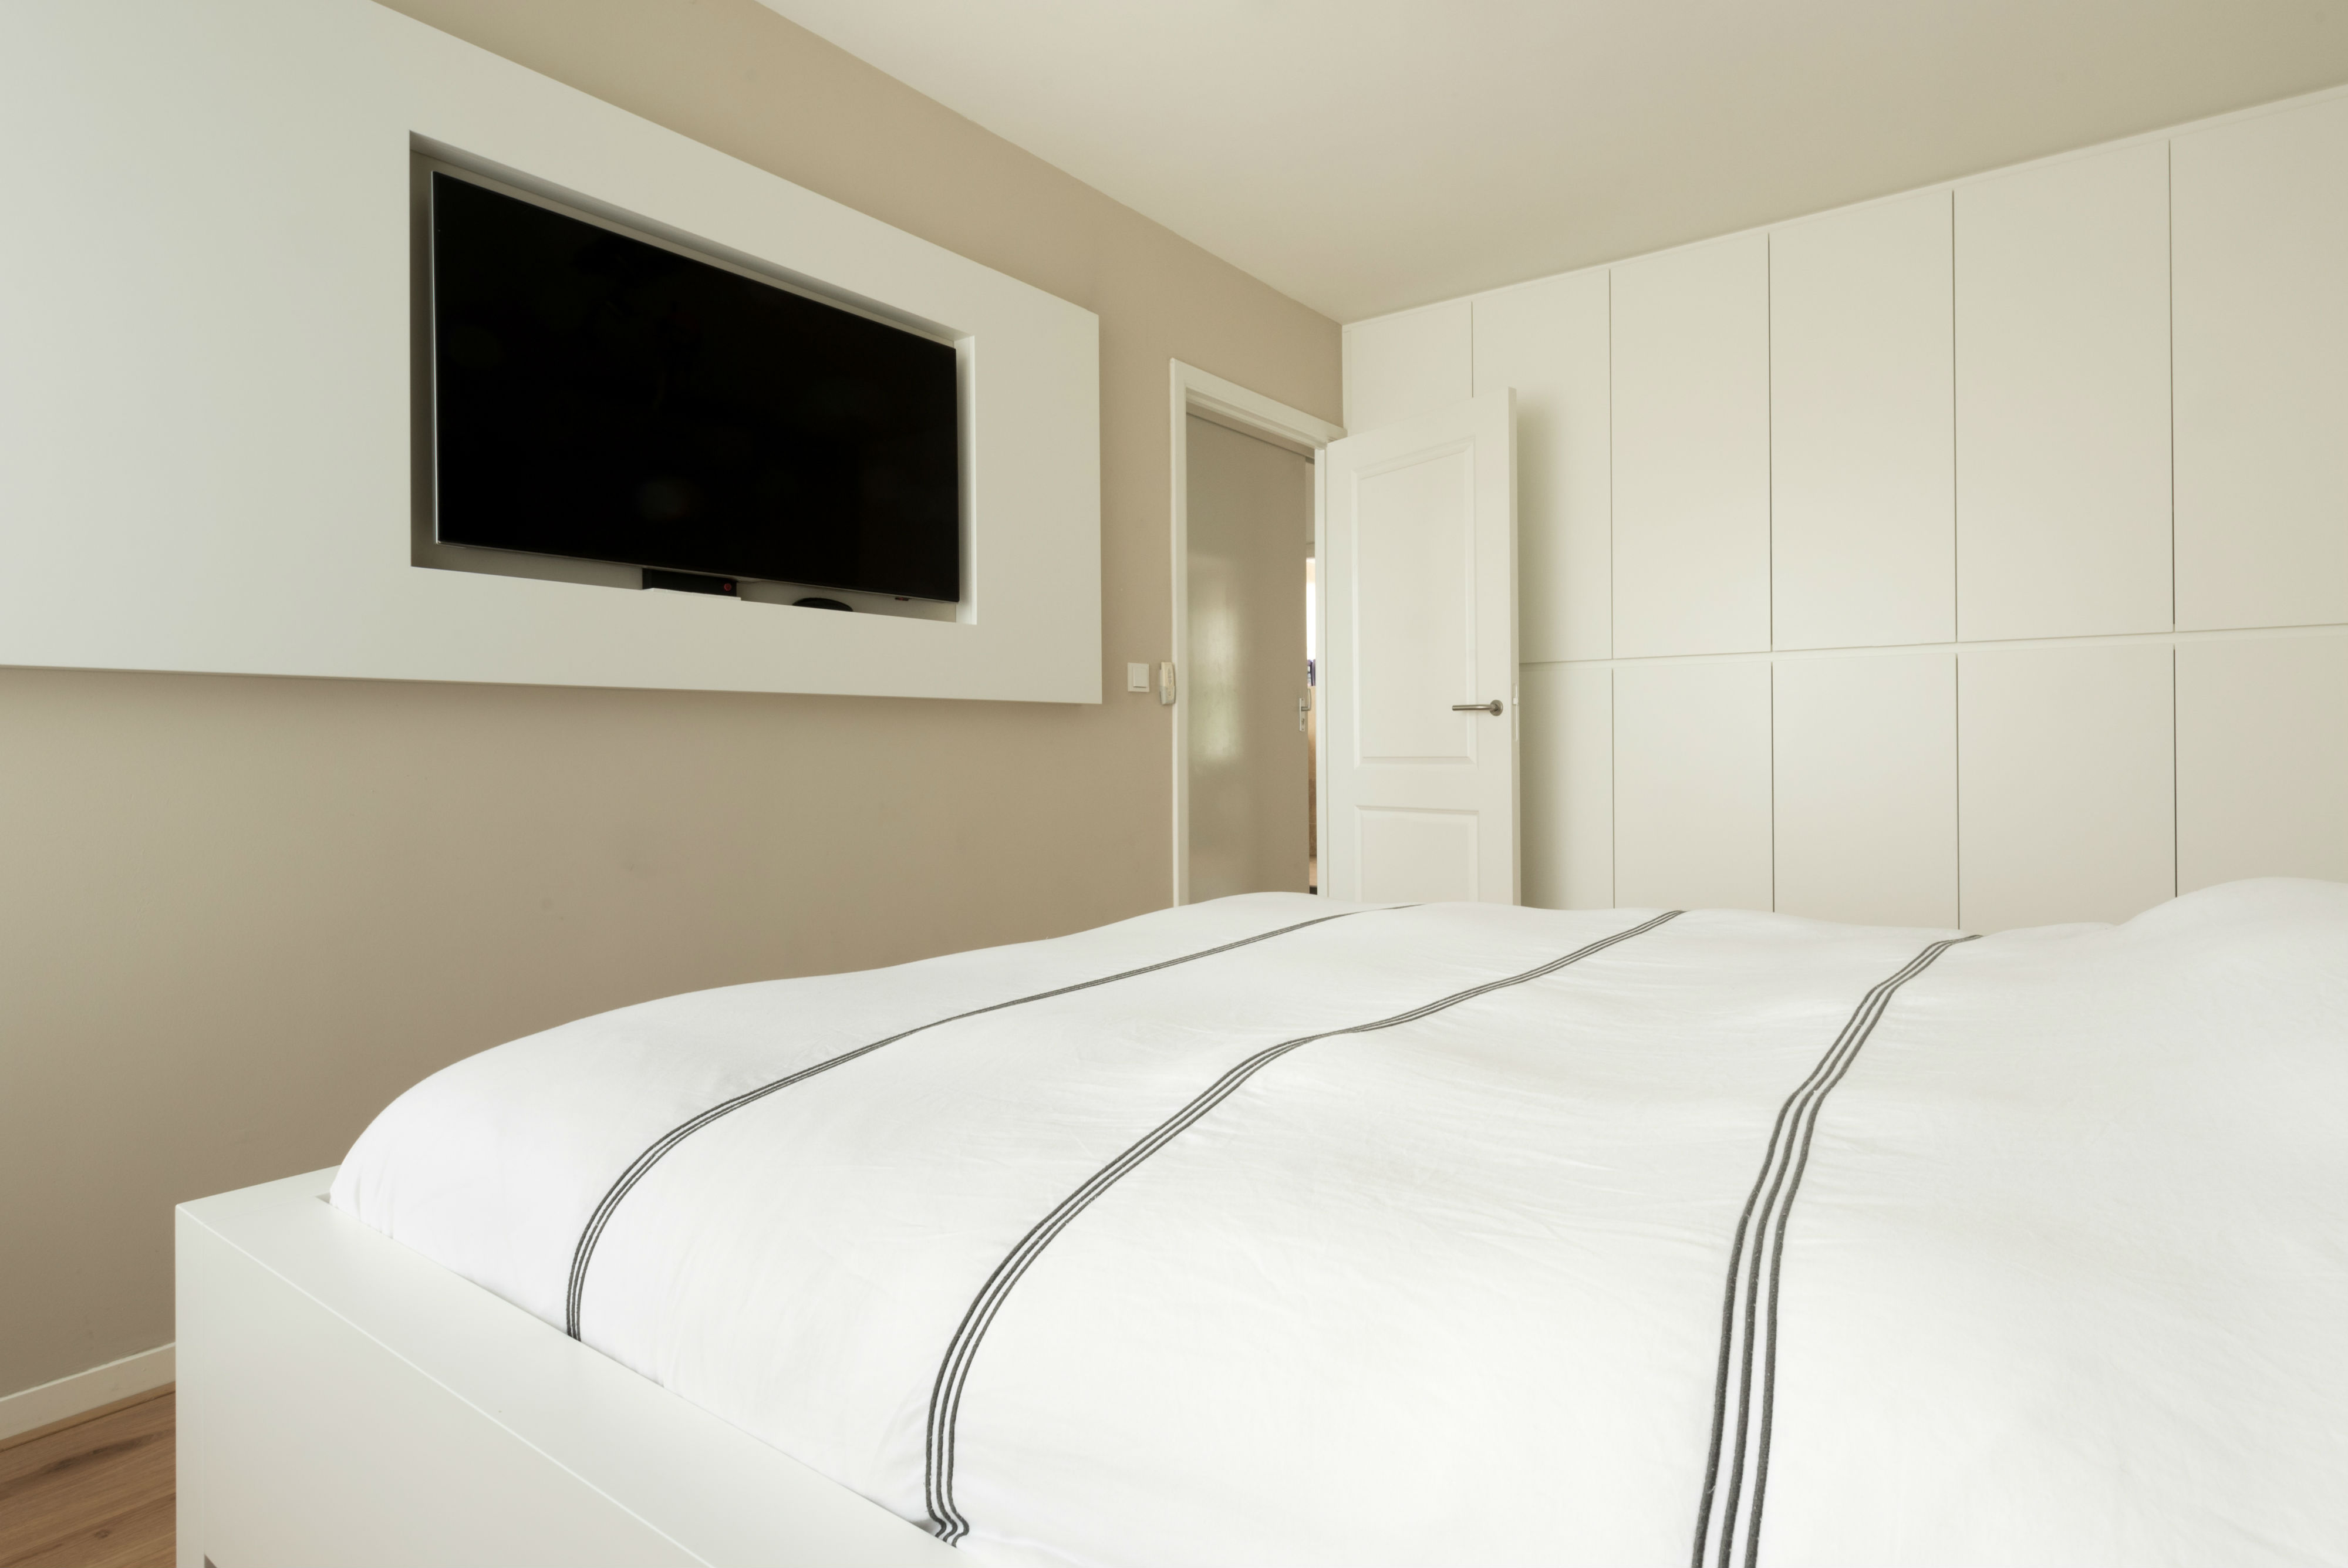 Slaapkamer met Garderobe Eindhoven - Jamo Restiau